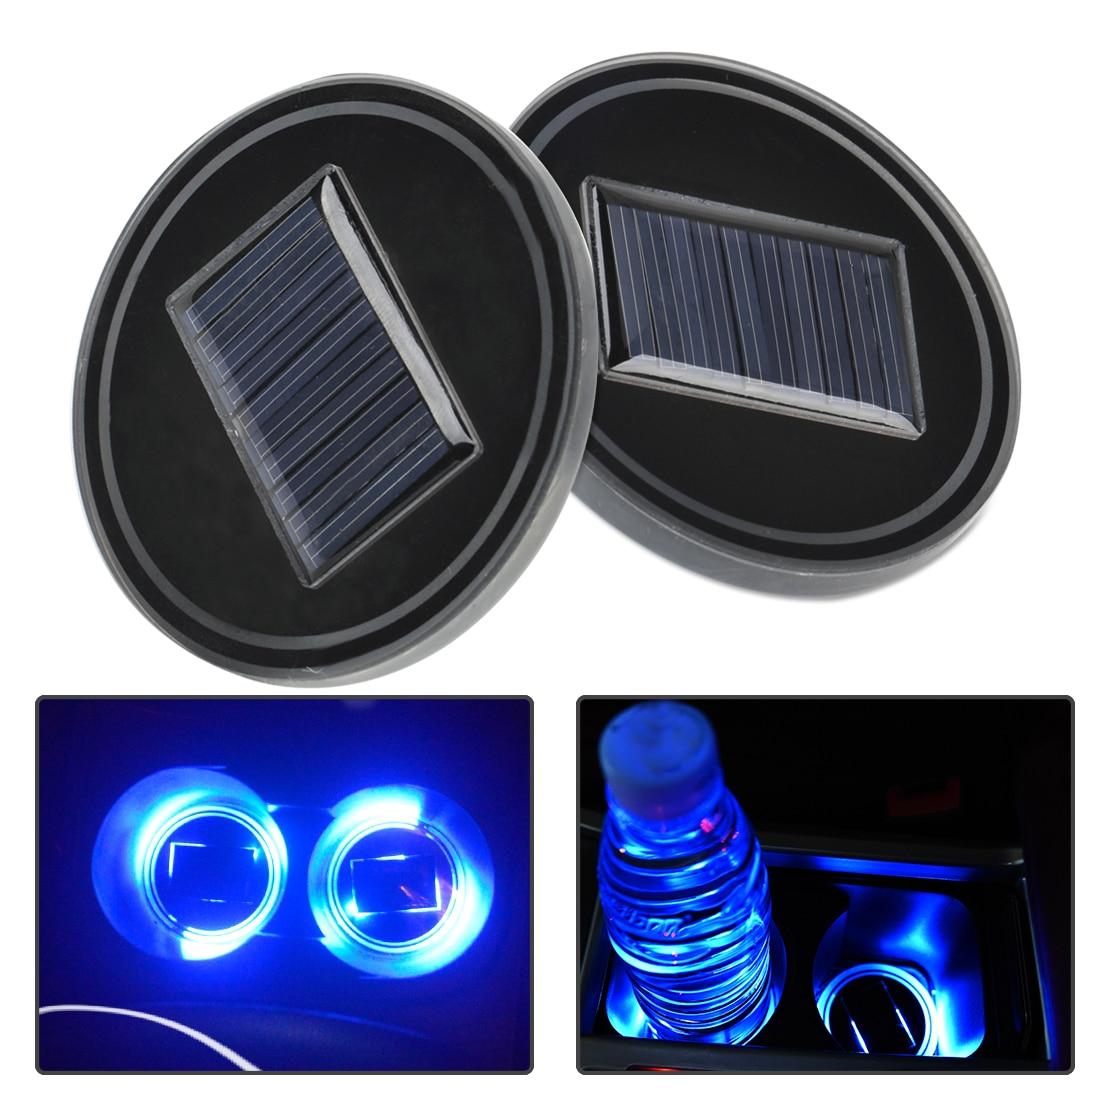 Dwcx 2pcs Car Solar Energy Cup Holder Bottom Pad Mat Blue Led Light Cover Trim Atmosphere Lamp Decor Fit For Vw Mercedes-benz Anti-slip Mat Automobiles & Motorcycles